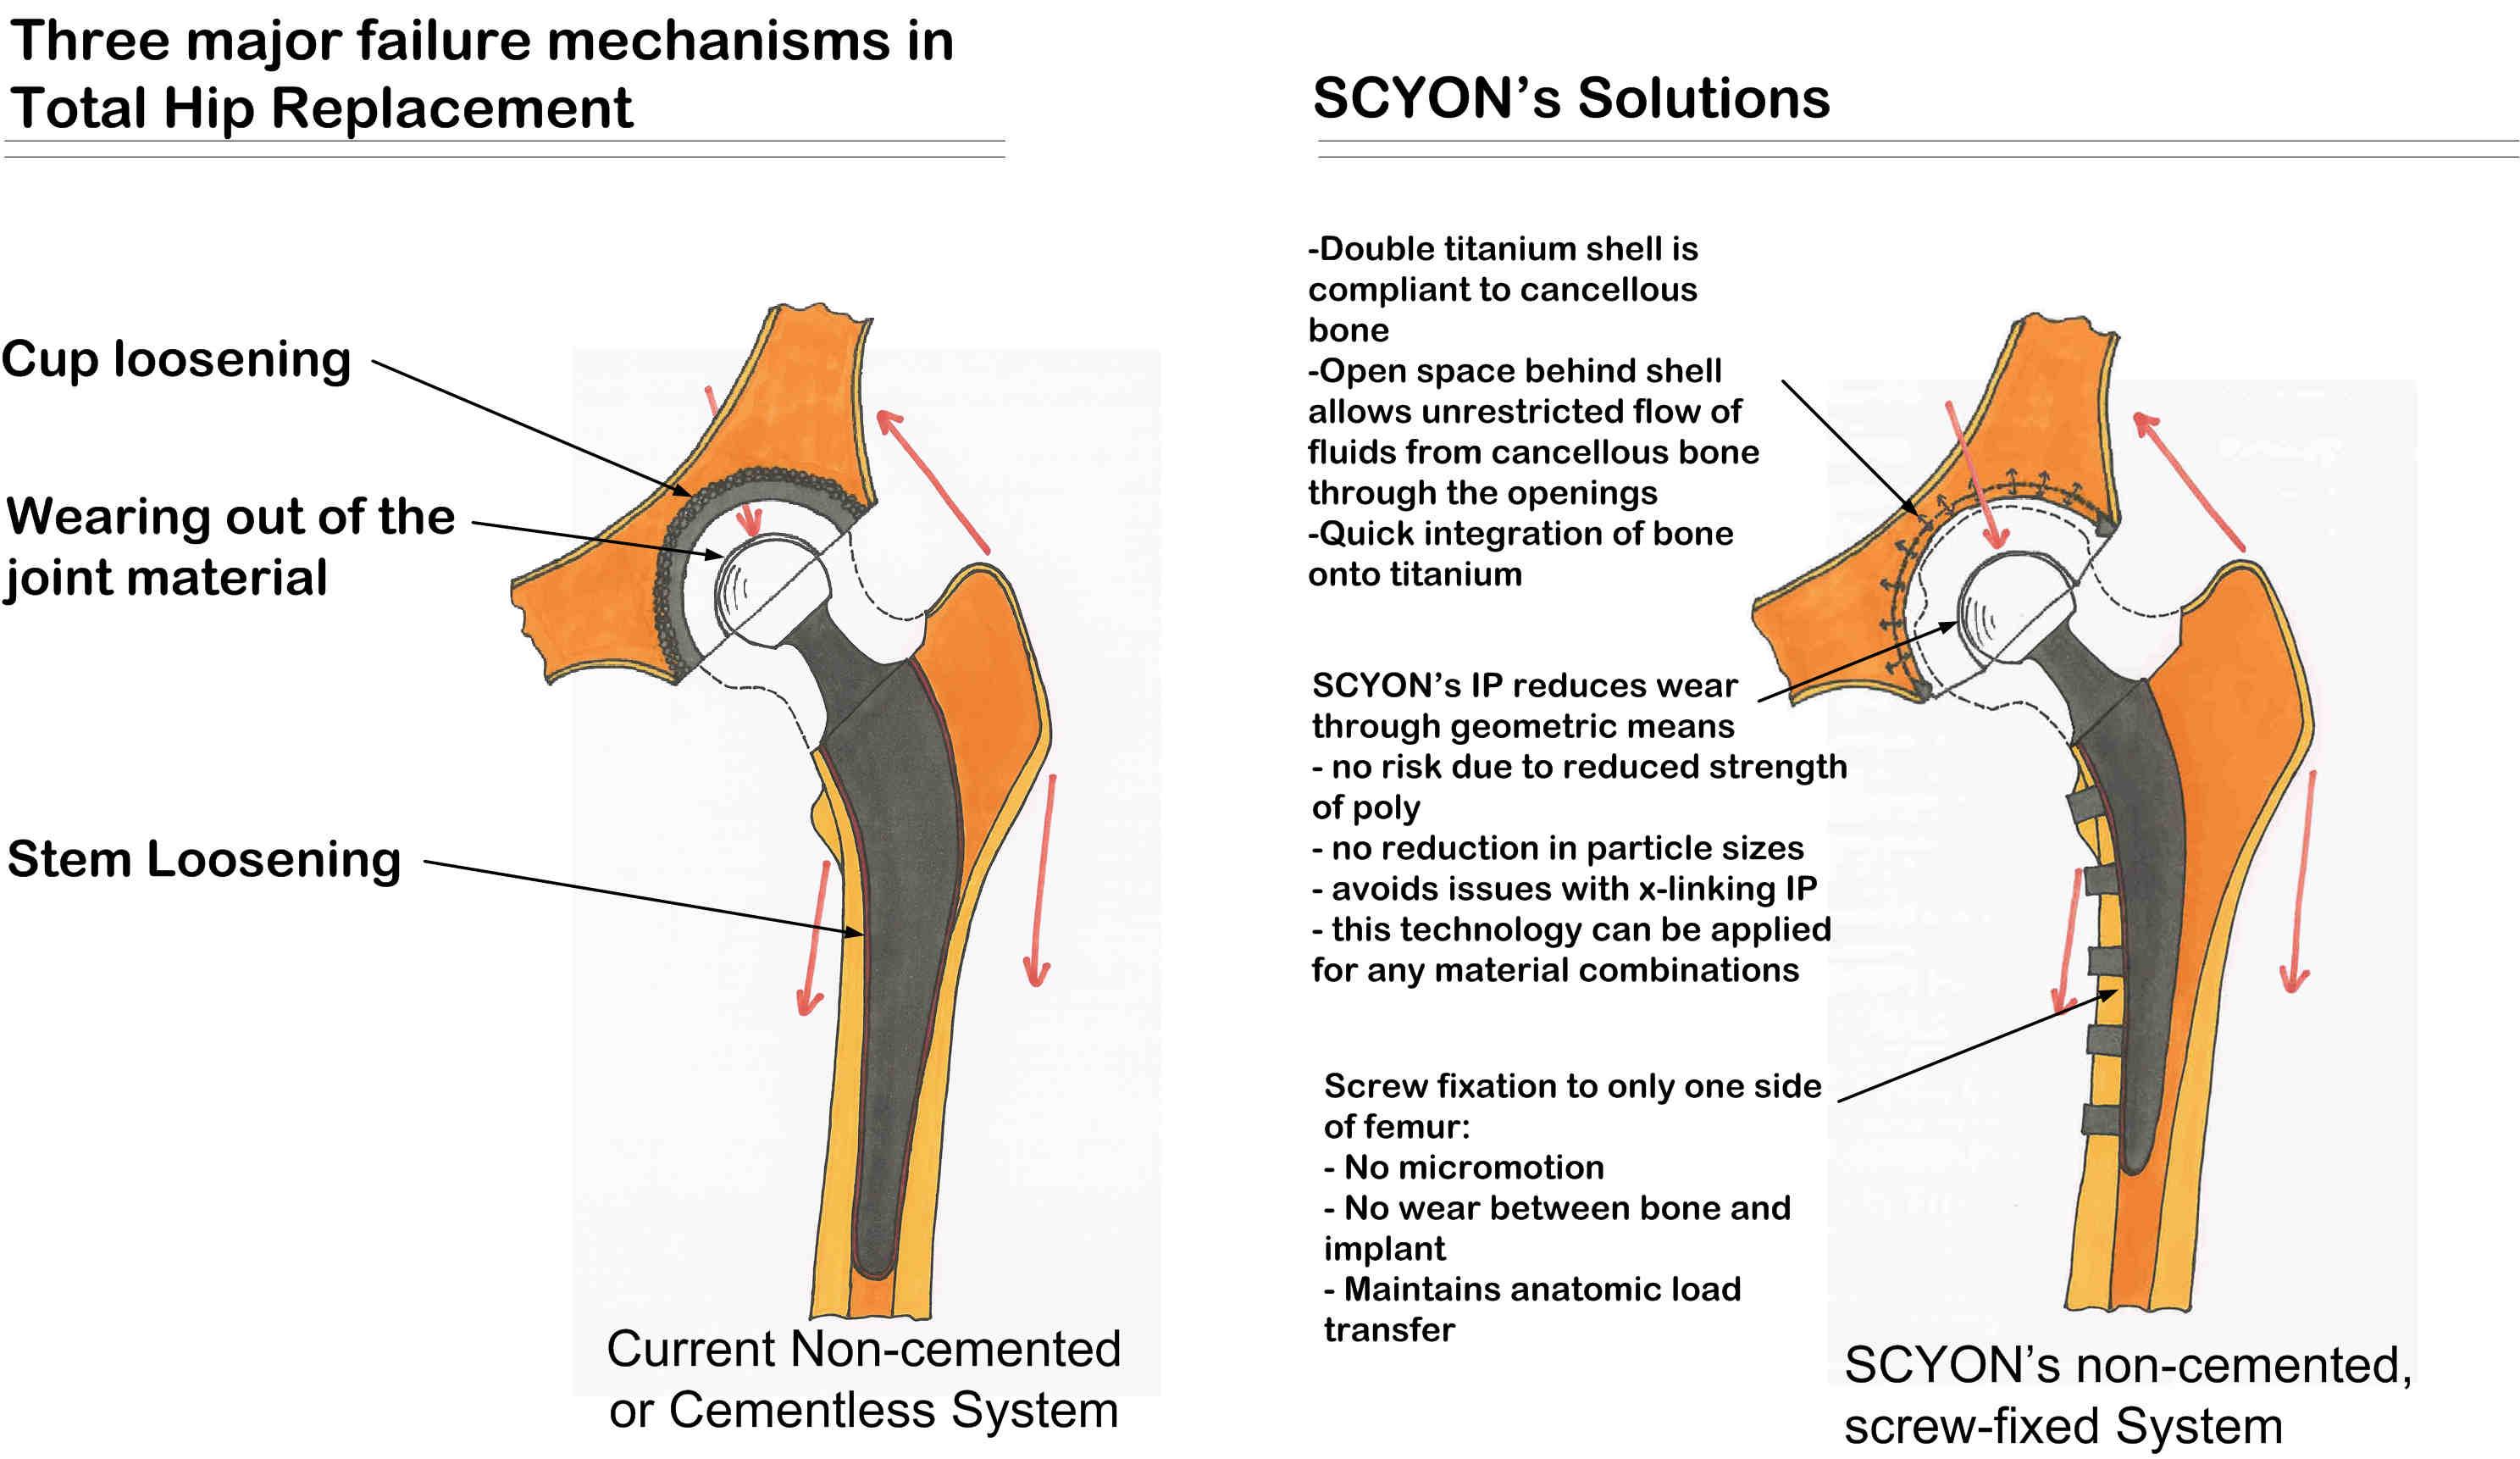 Scyon orthopaedics - hip replacement surgery implants